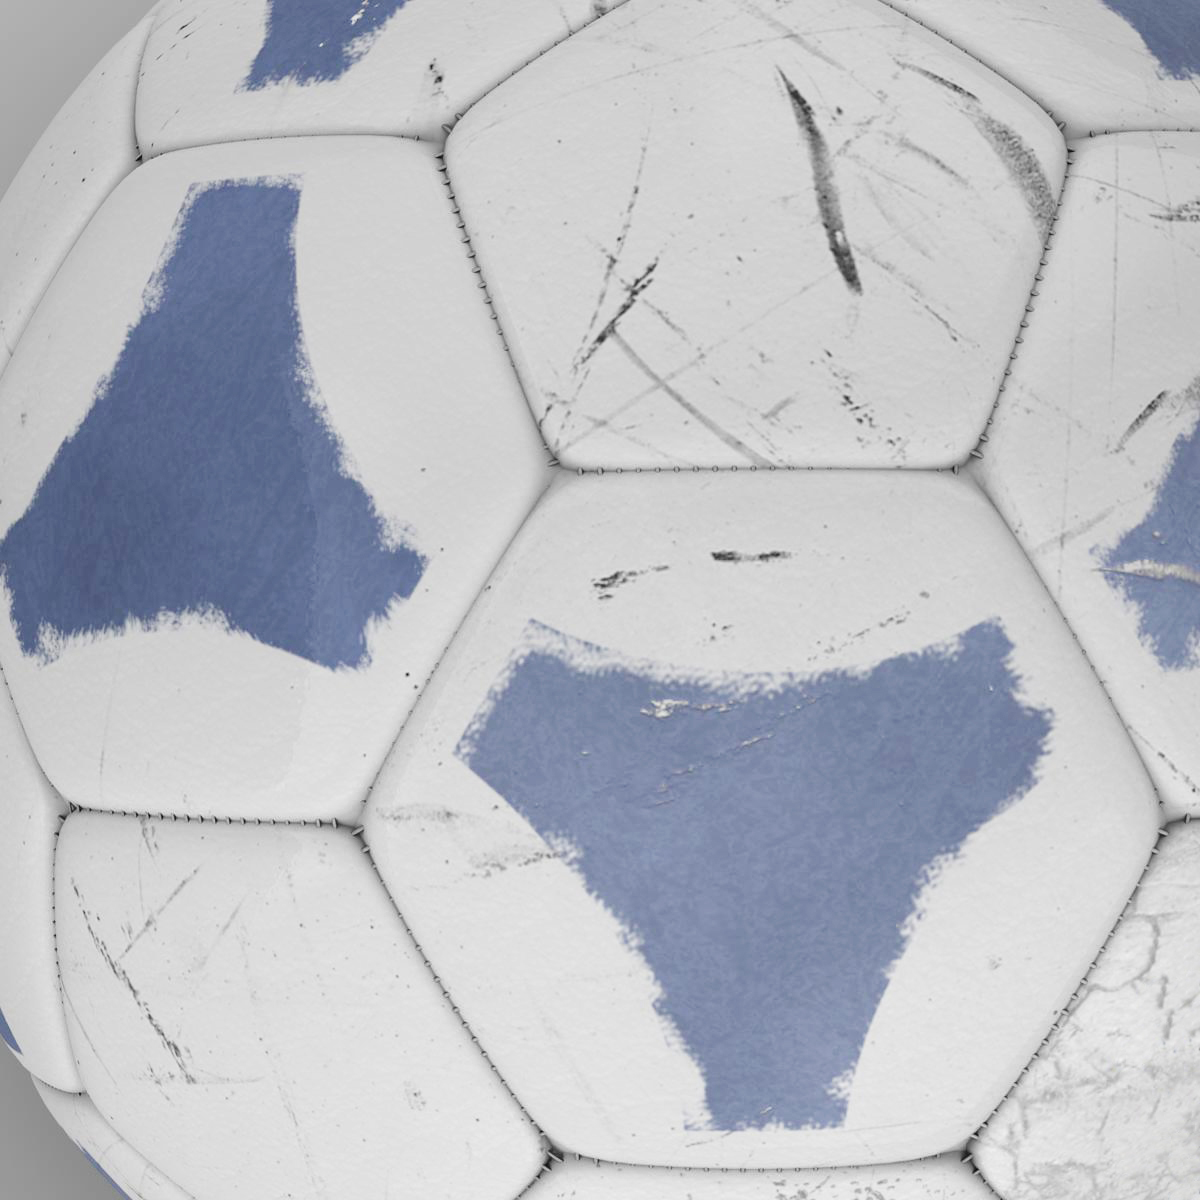 soccerball цэнхэр цагаан 3d загвар 3ds max fbx c4d ma mb obj 203984